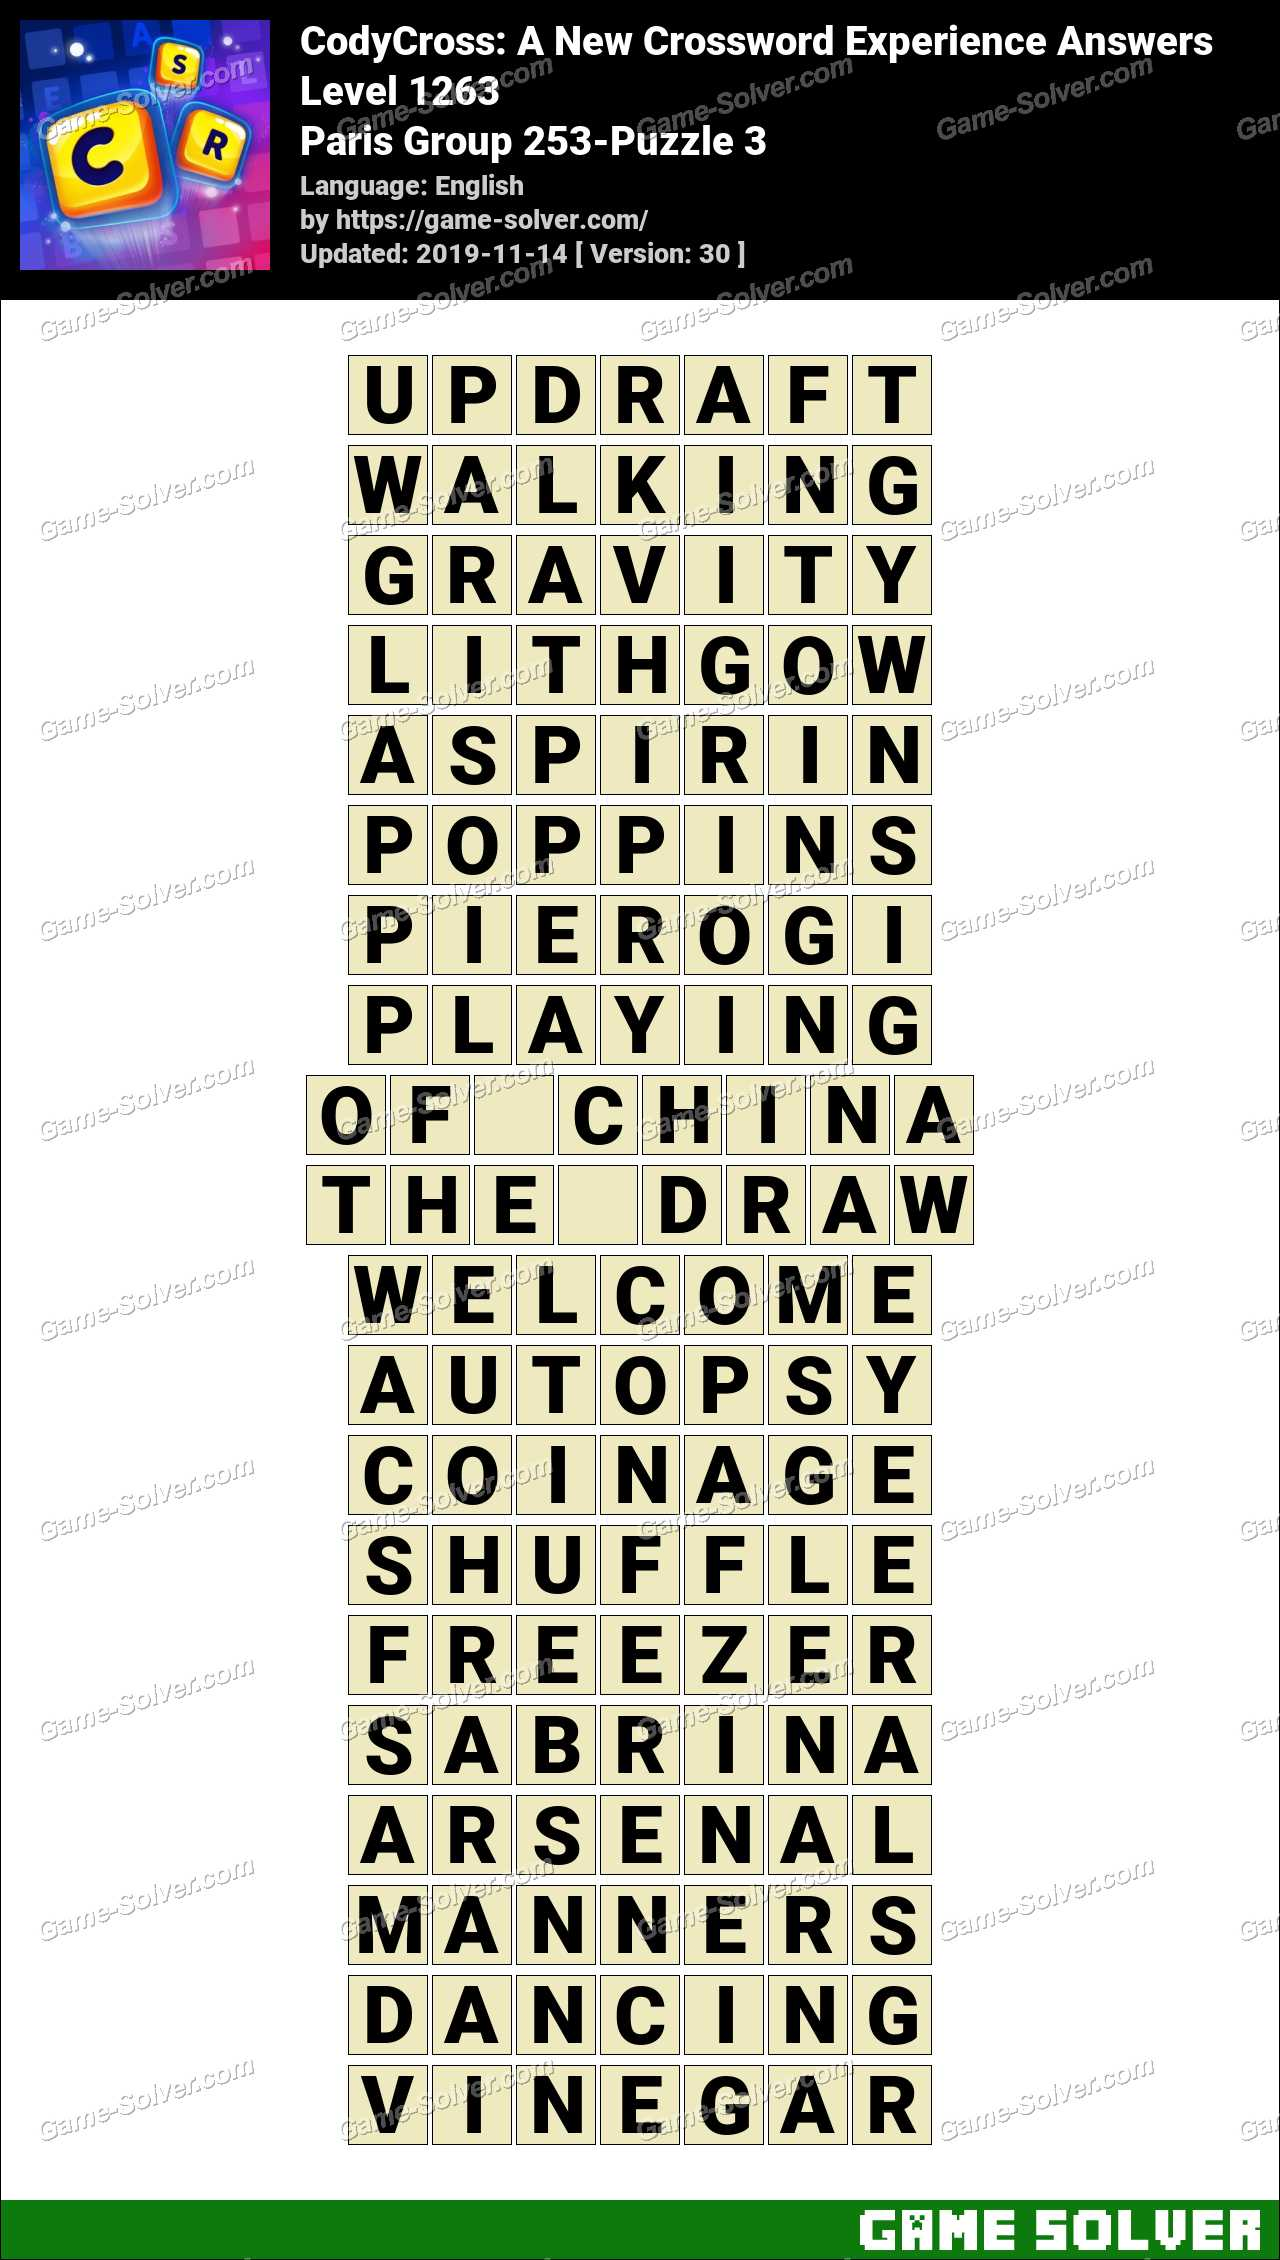 CodyCross Paris Group 253-Puzzle 3 Answers